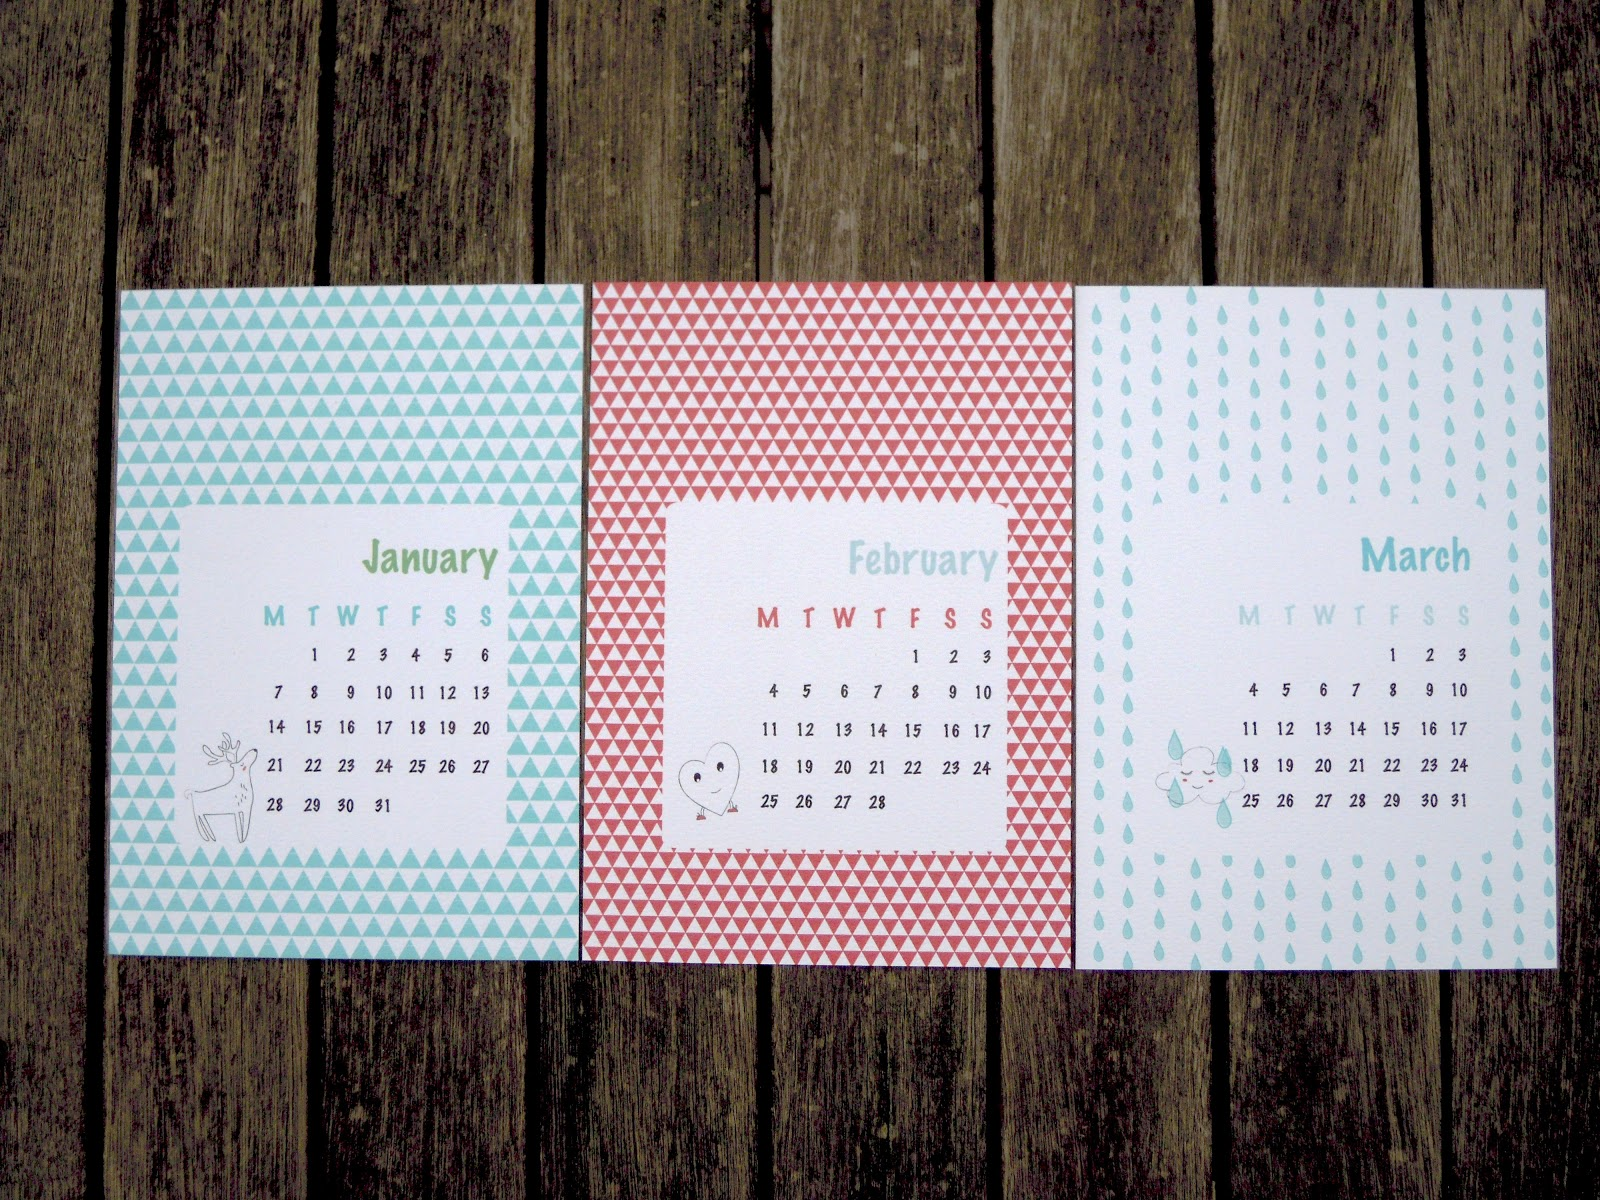 Handmade Calendar Designs : Mi ed design handmade illustrated calendar now on sale